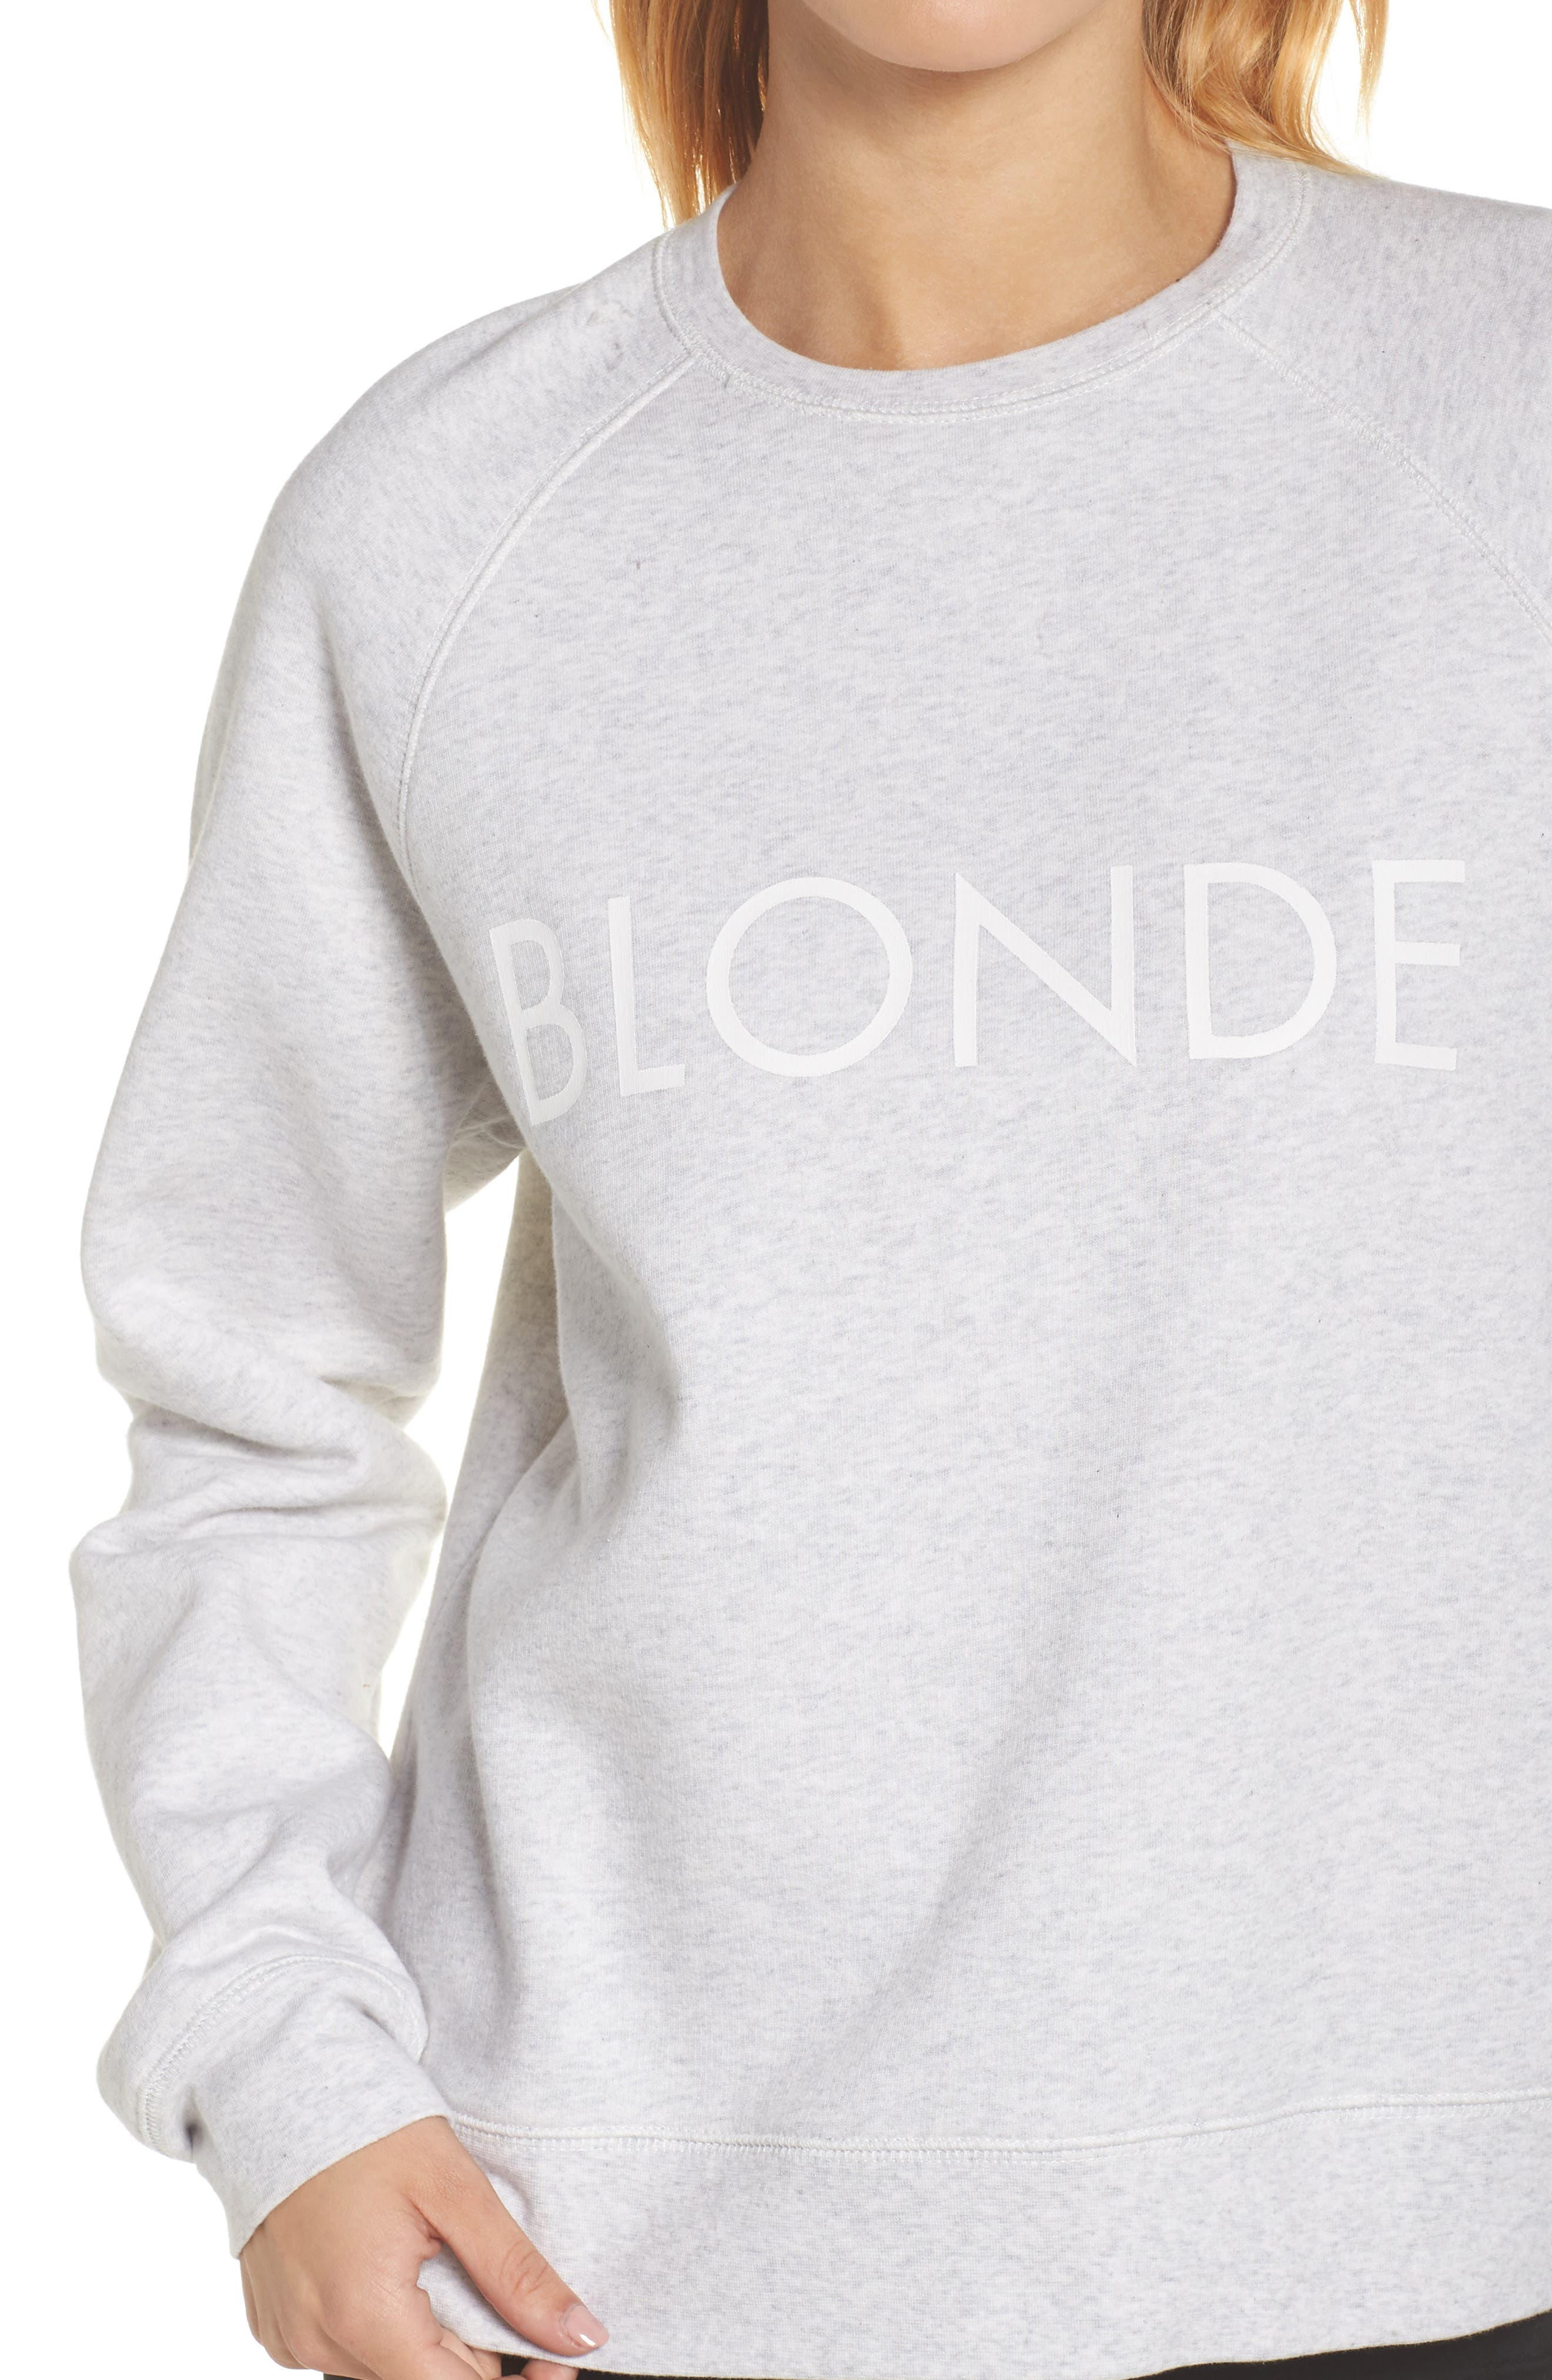 Blonde Sweatshirt,                             Alternate thumbnail 4, color,                             Oatmeal